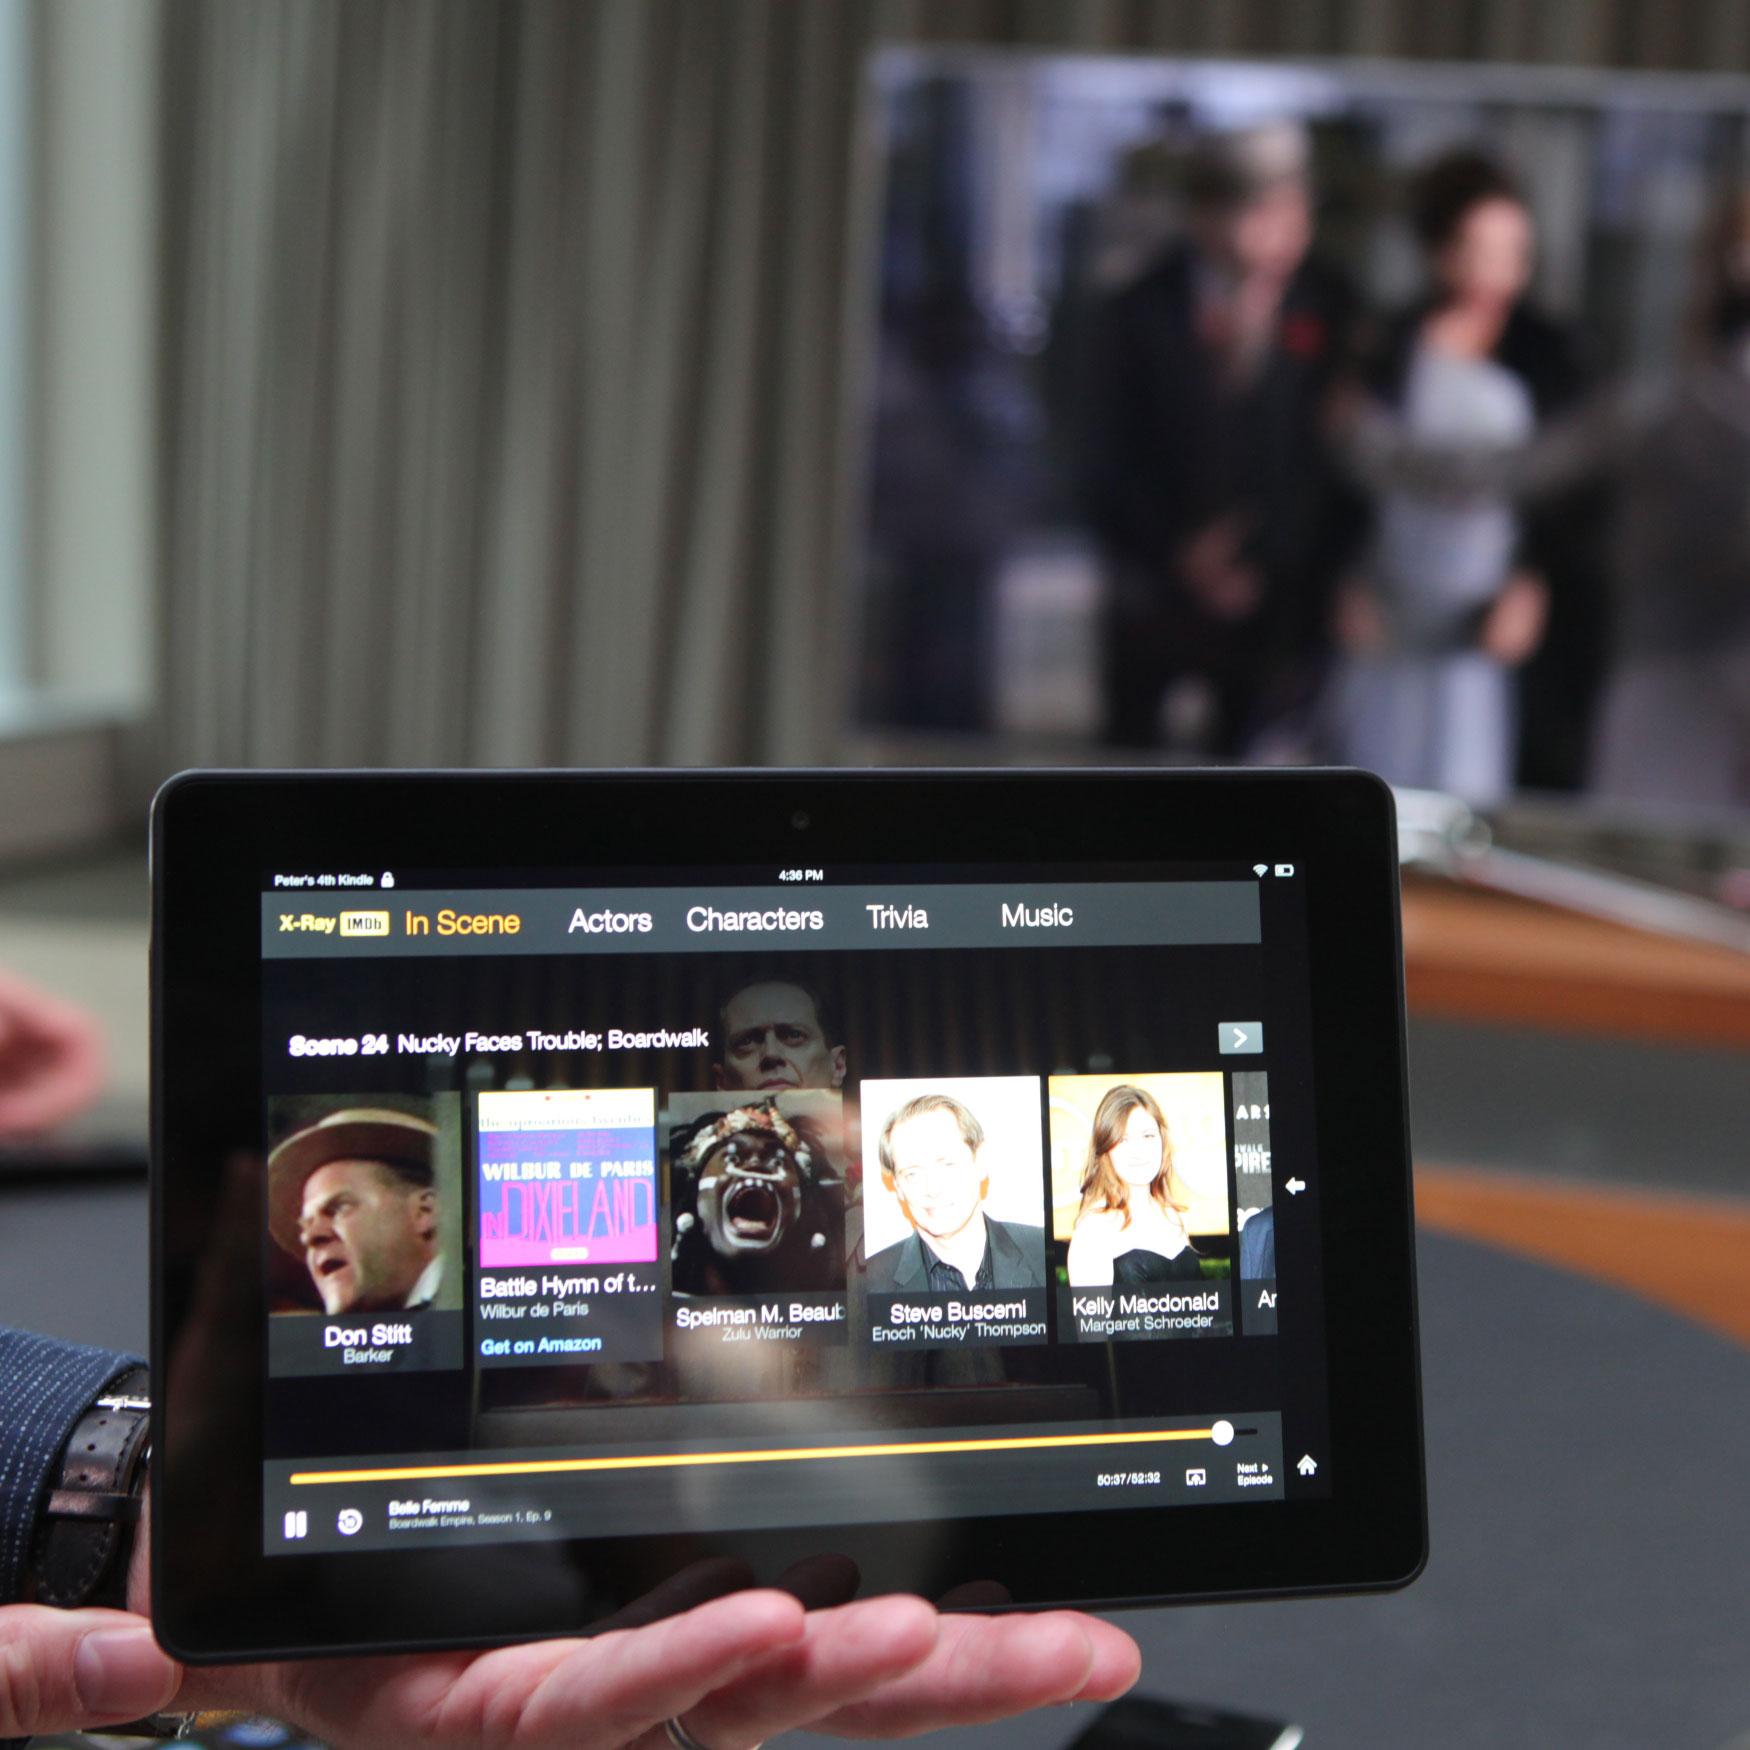 Kindle HDX screen sharing